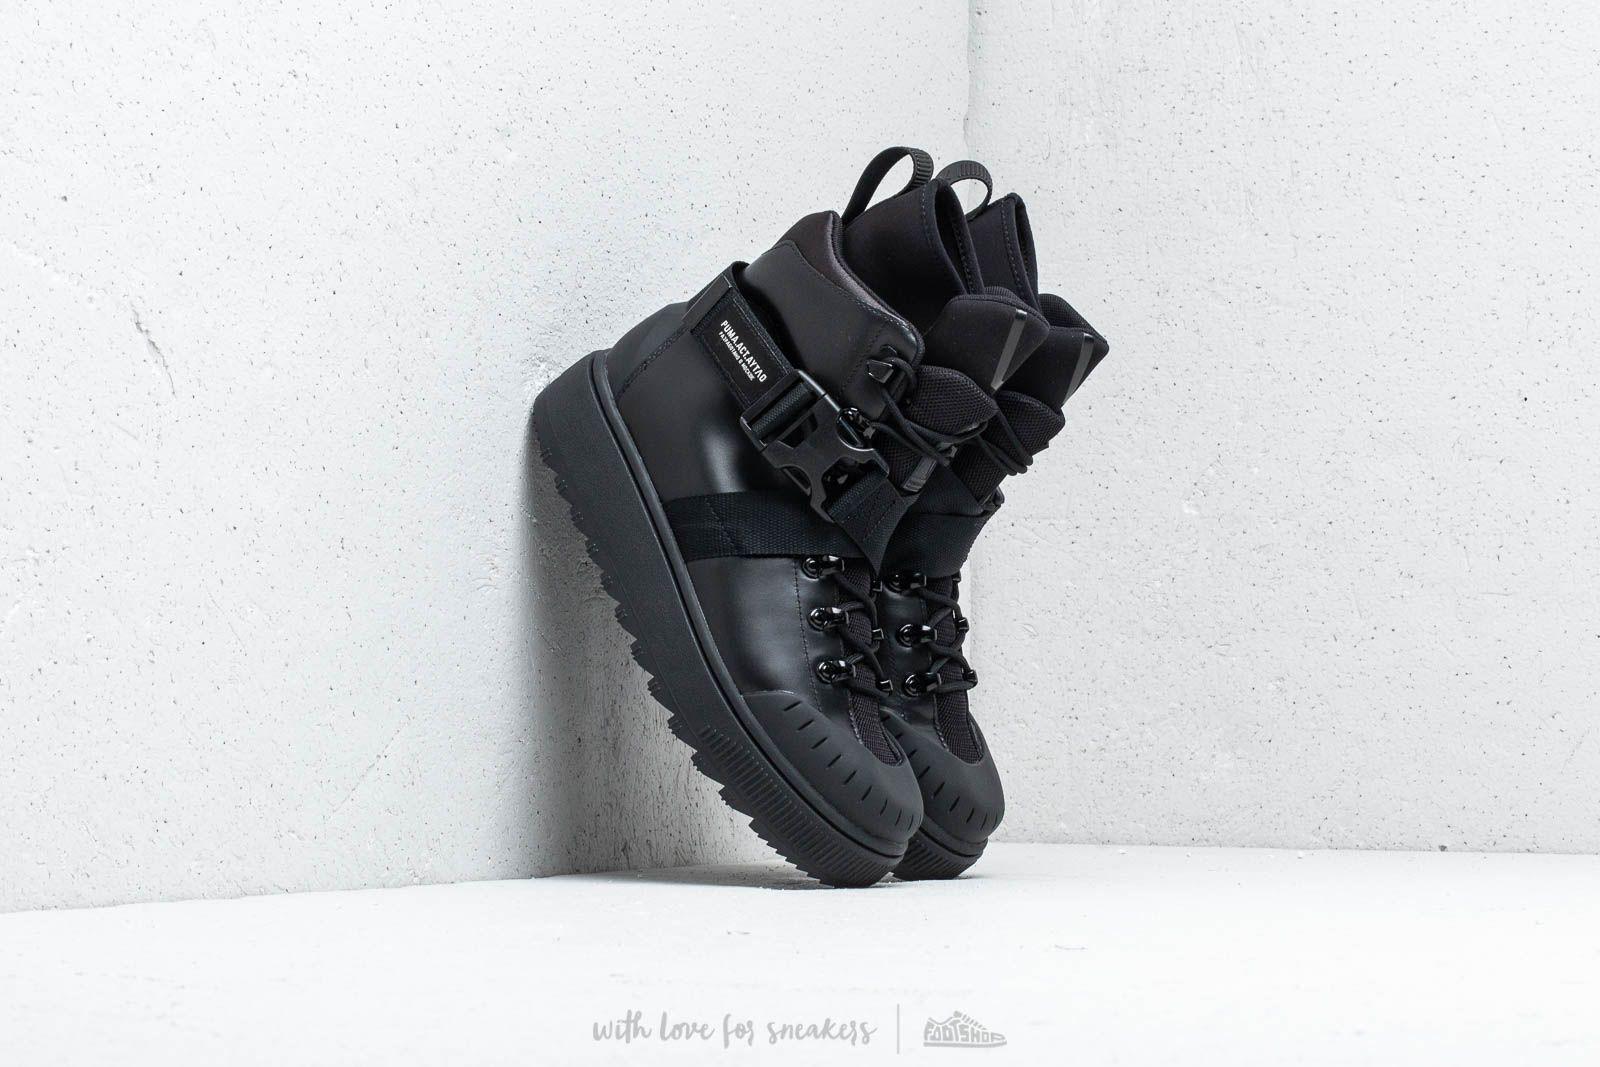 regimiento Barricada Legado  Men's shoes Puma x Outlaw Moscow Ren Boot Puma Black | Footshop